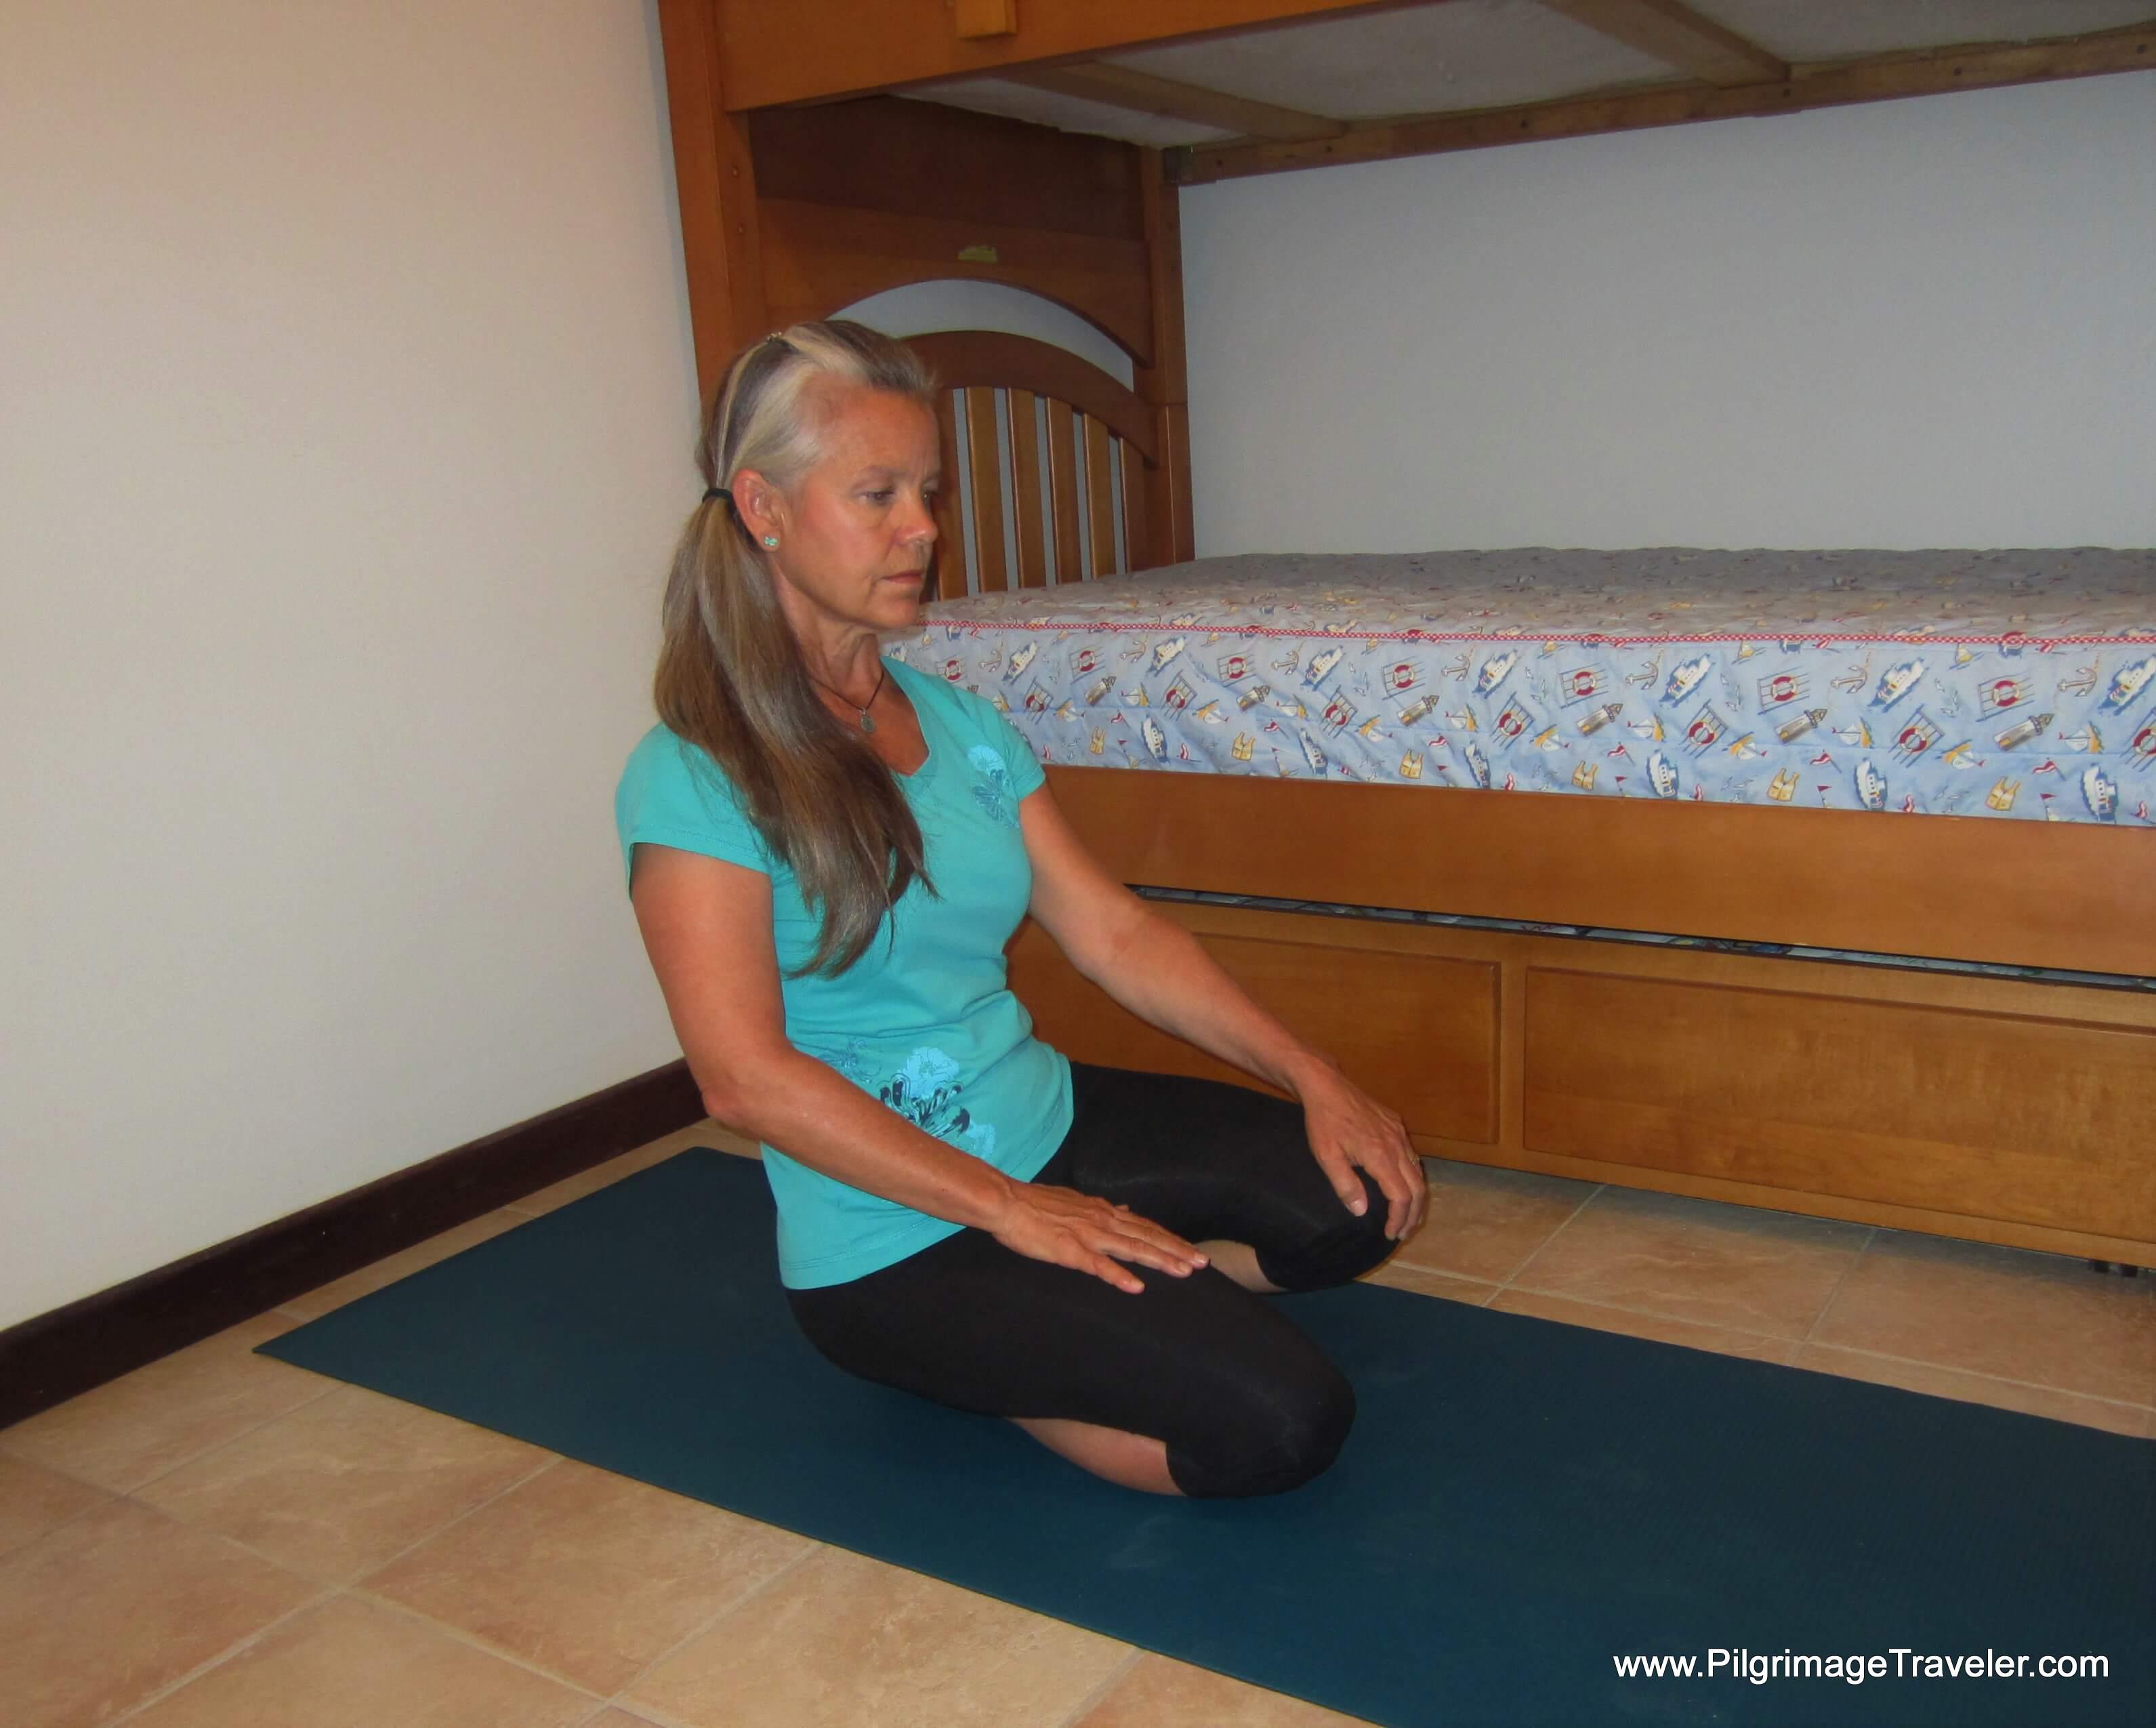 Ankle Plantar Flexion Stretch - Step Two